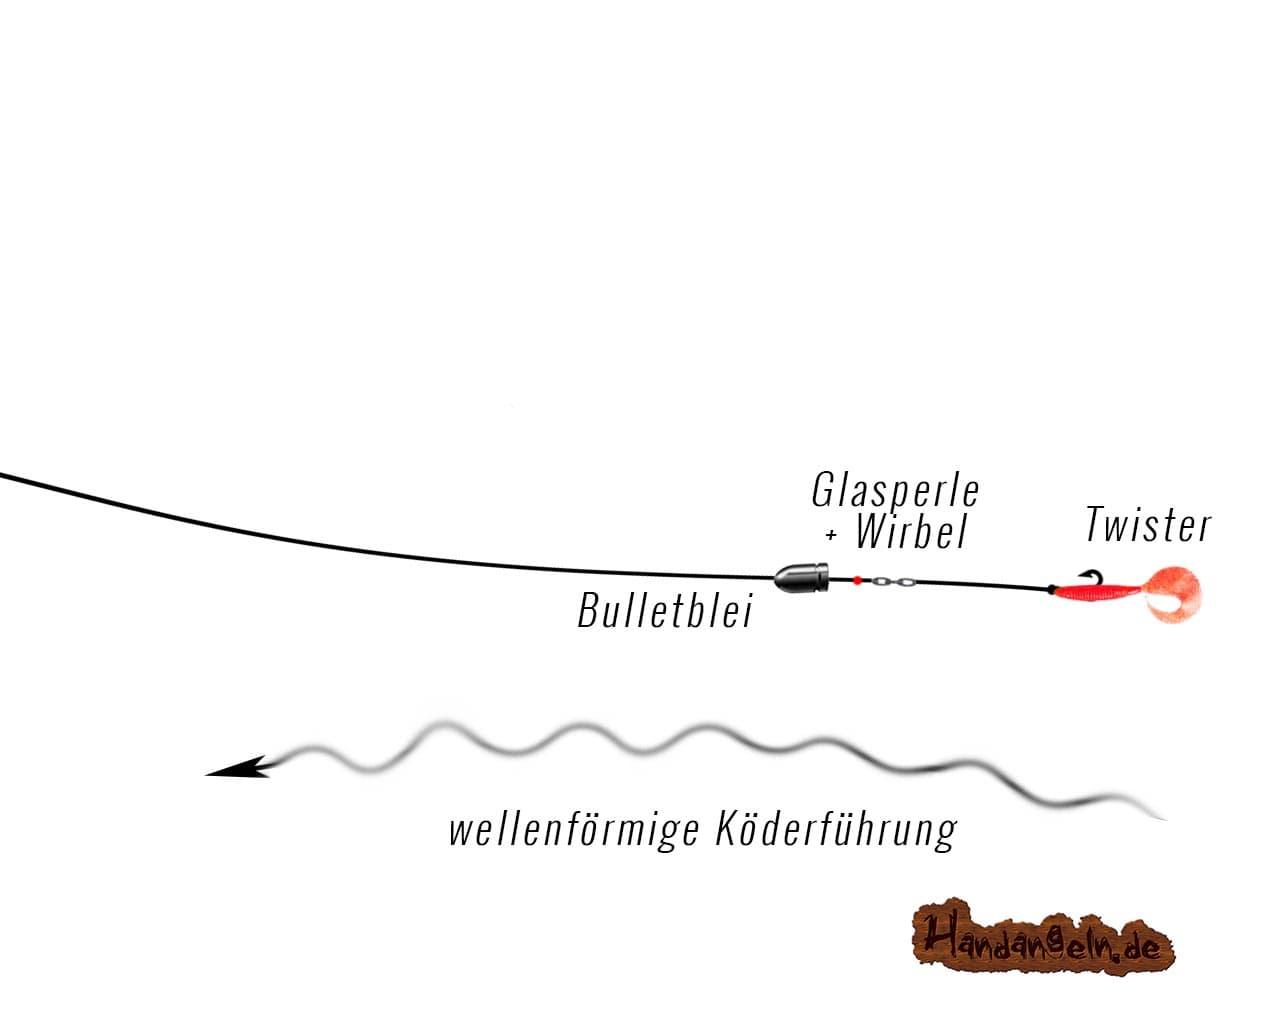 Carolina Rig Köderführung wellenförmige Bewegung